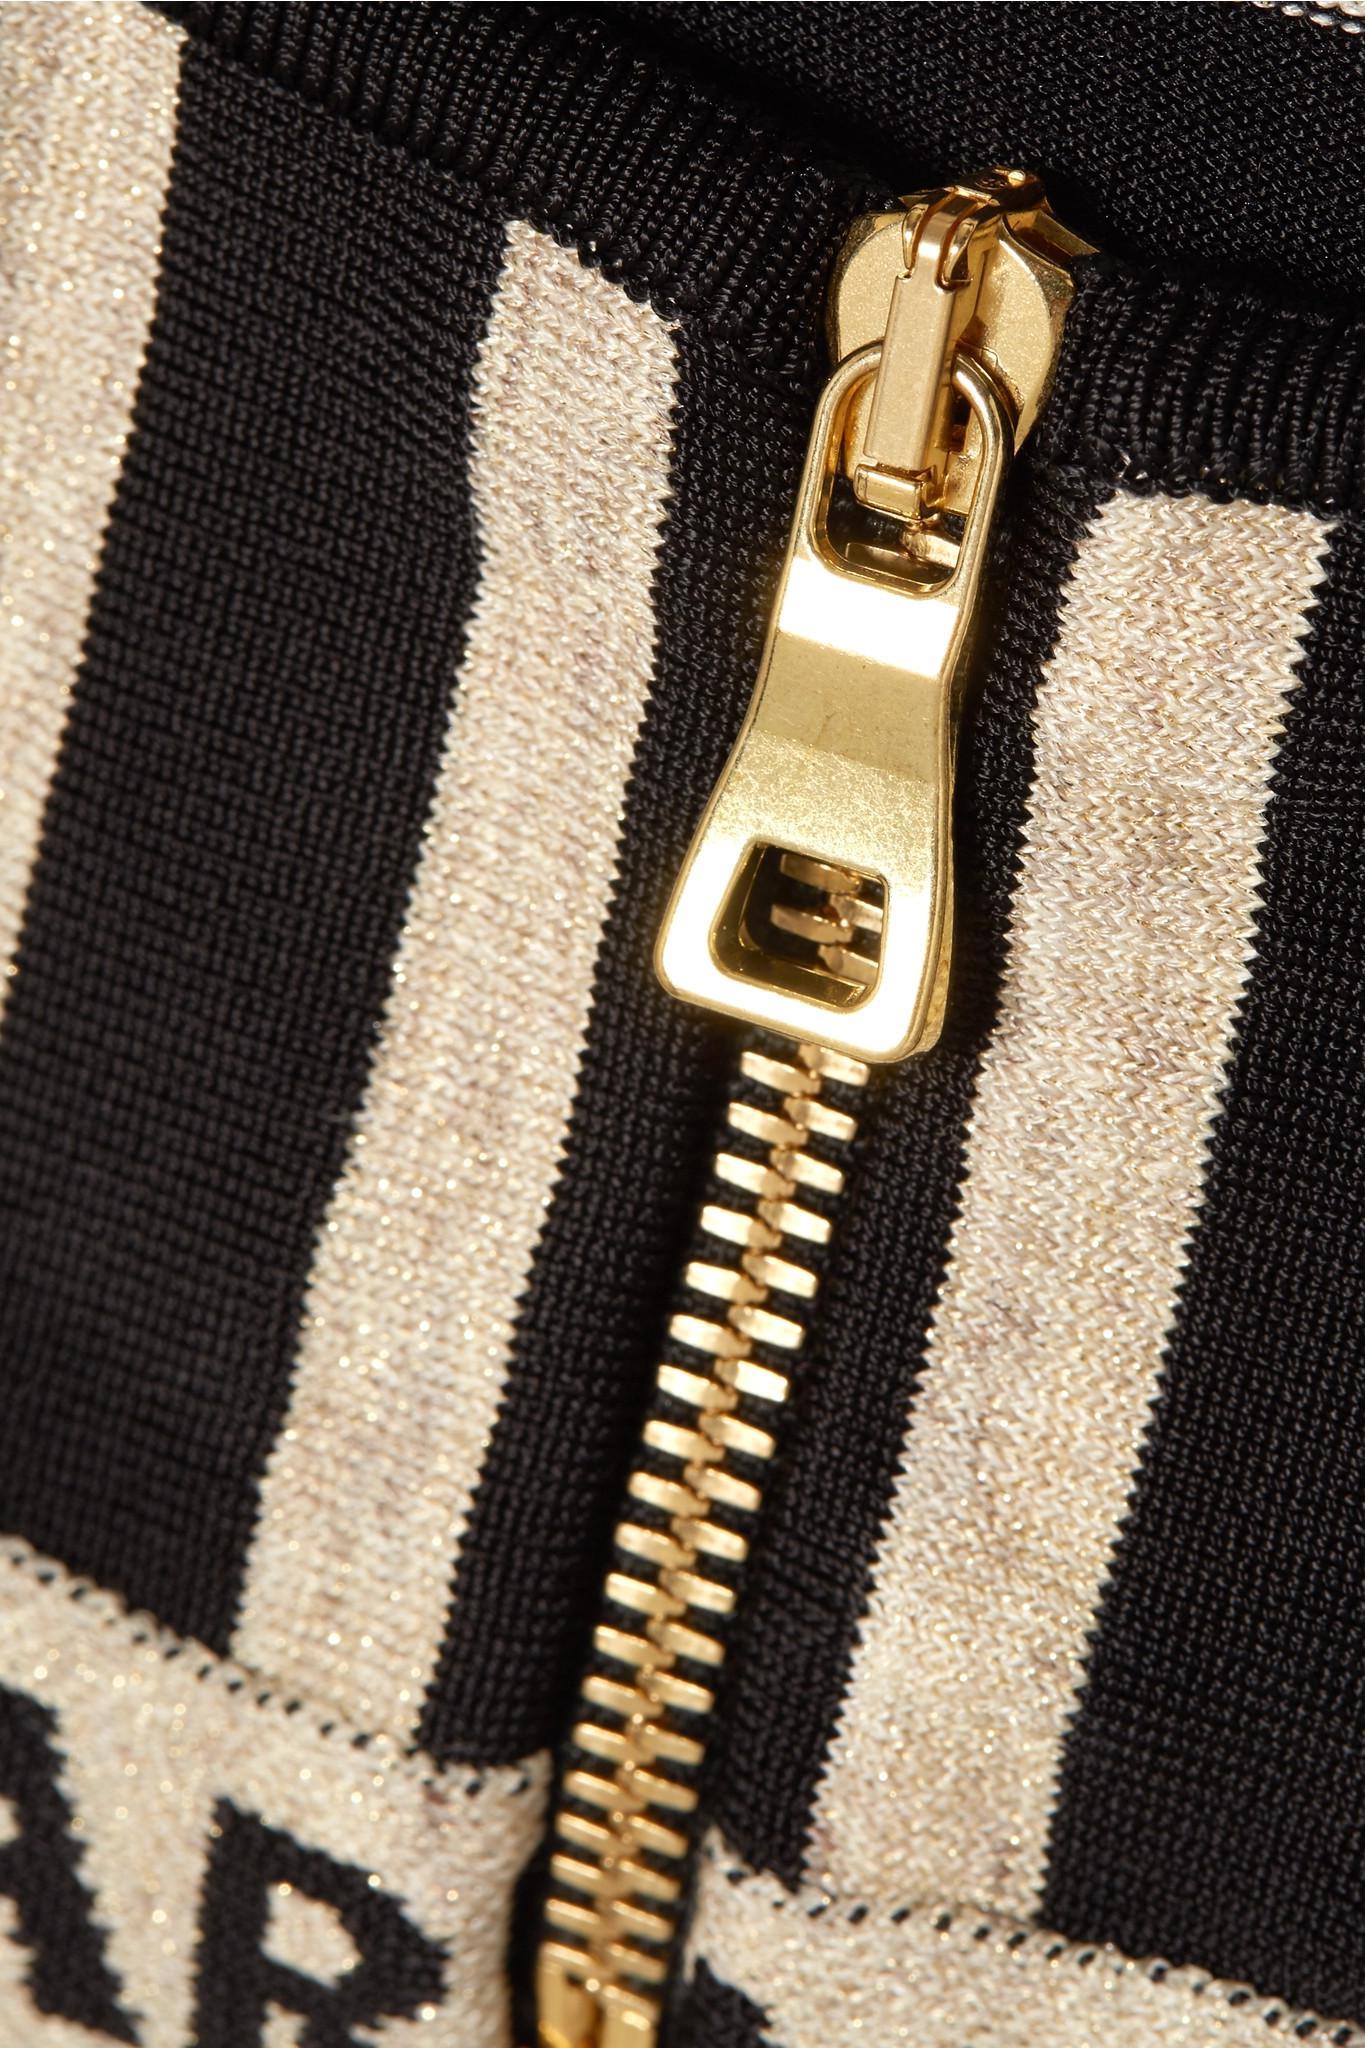 d97917d217 Balmain - Black Metallic Intarsia-trimmed Striped Stretch-knit Bralette -  Lyst. View fullscreen